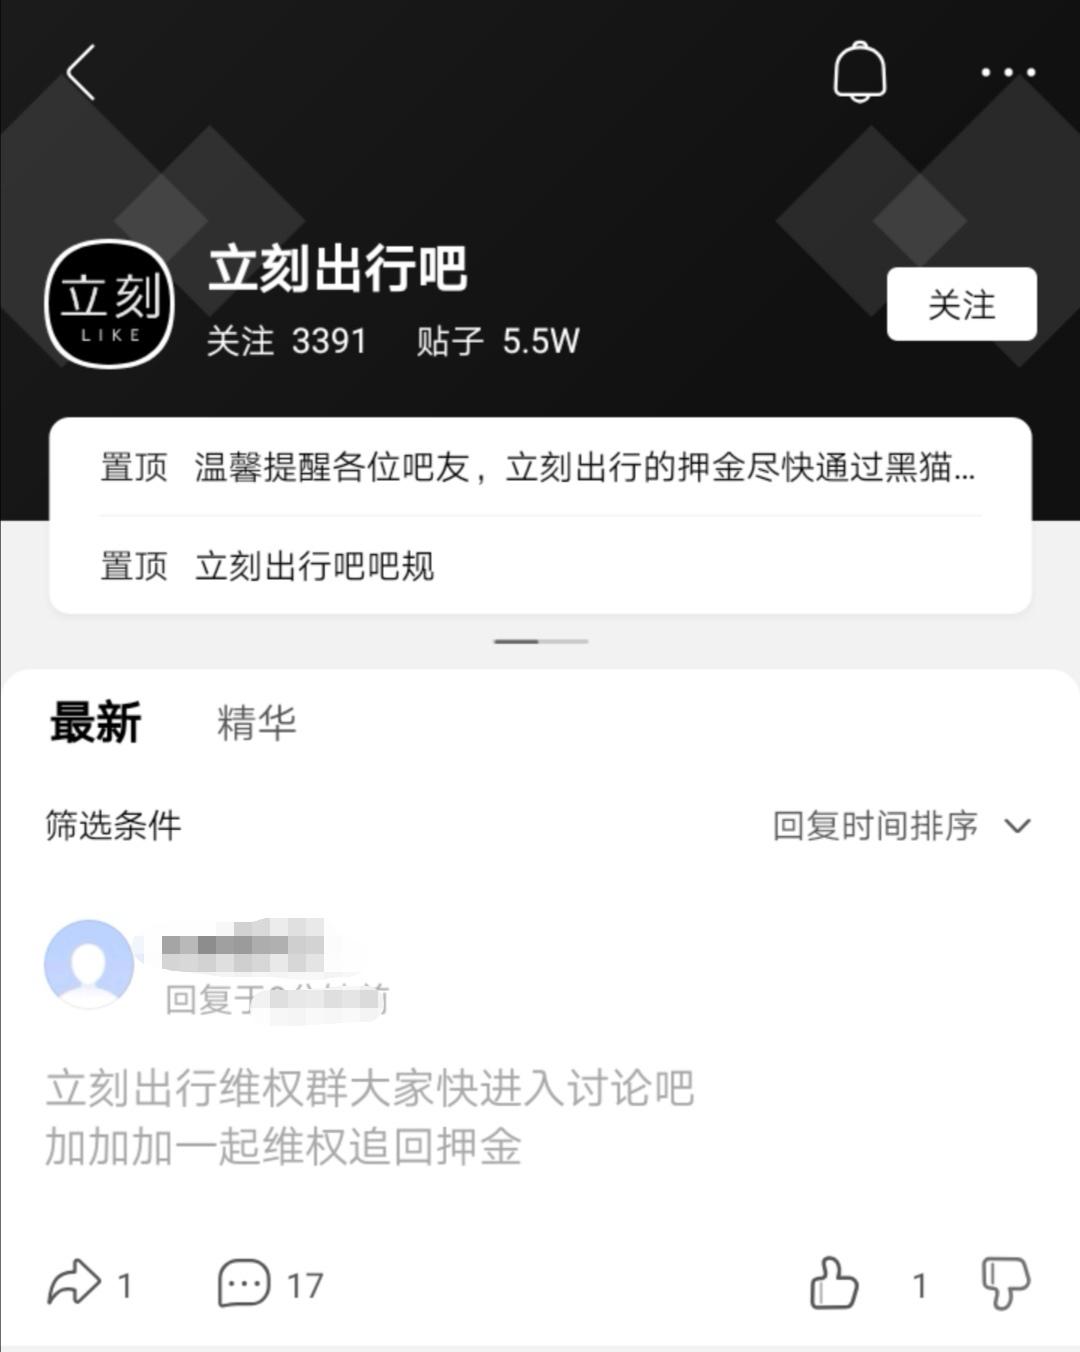 www.w66.com国际|蔚来汽车遭遇至暗时刻:股东权益为负 偿债能力堪忧